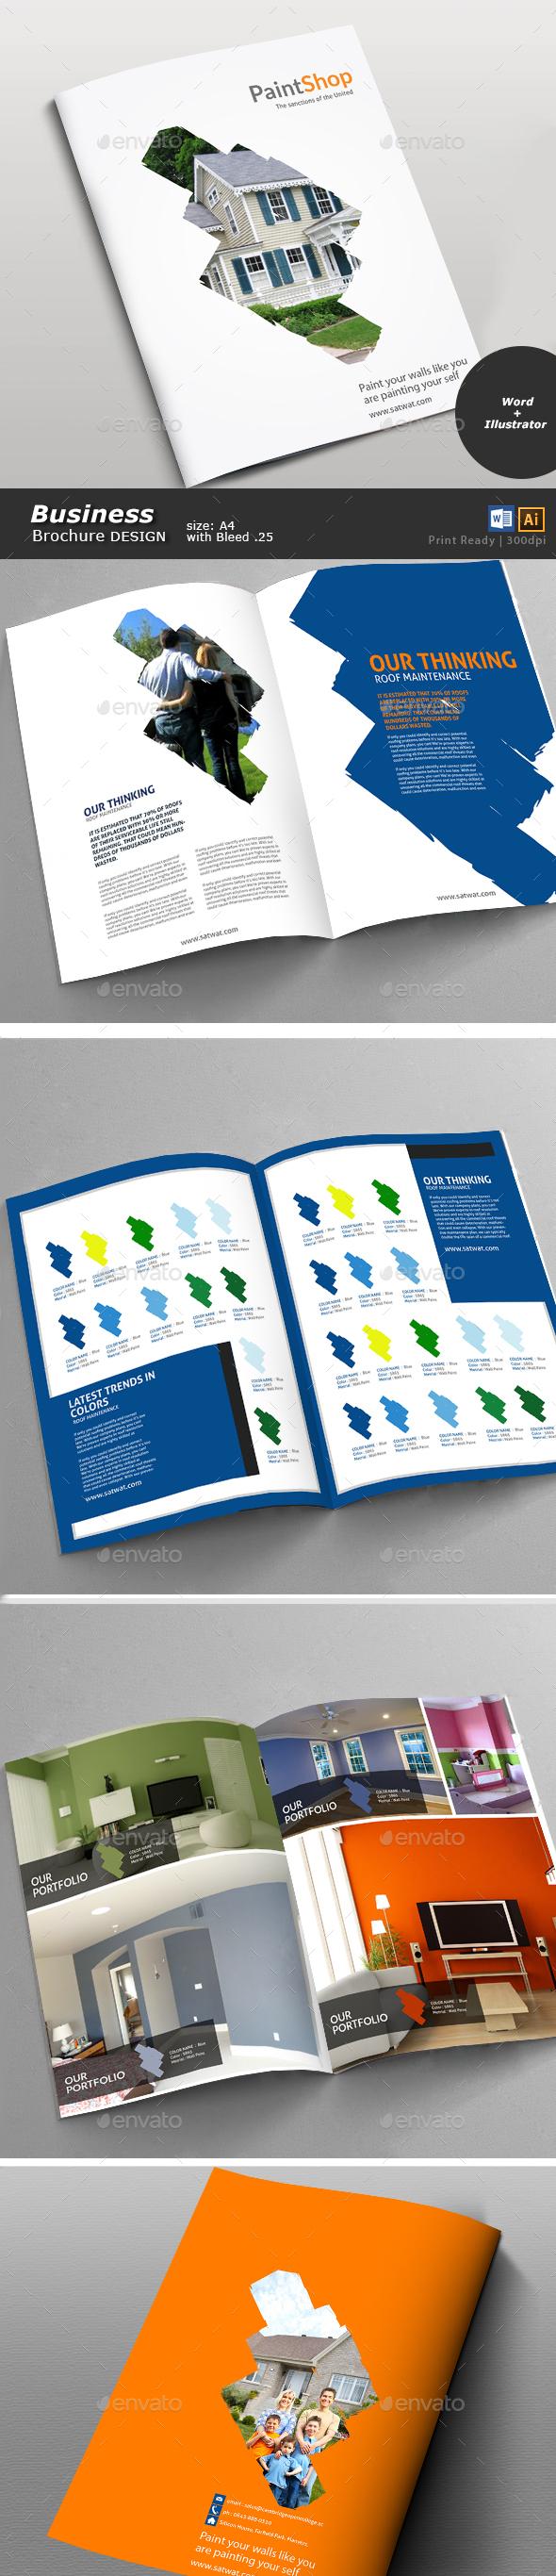 Paint Shop Brochure  - Brochures Print Templates